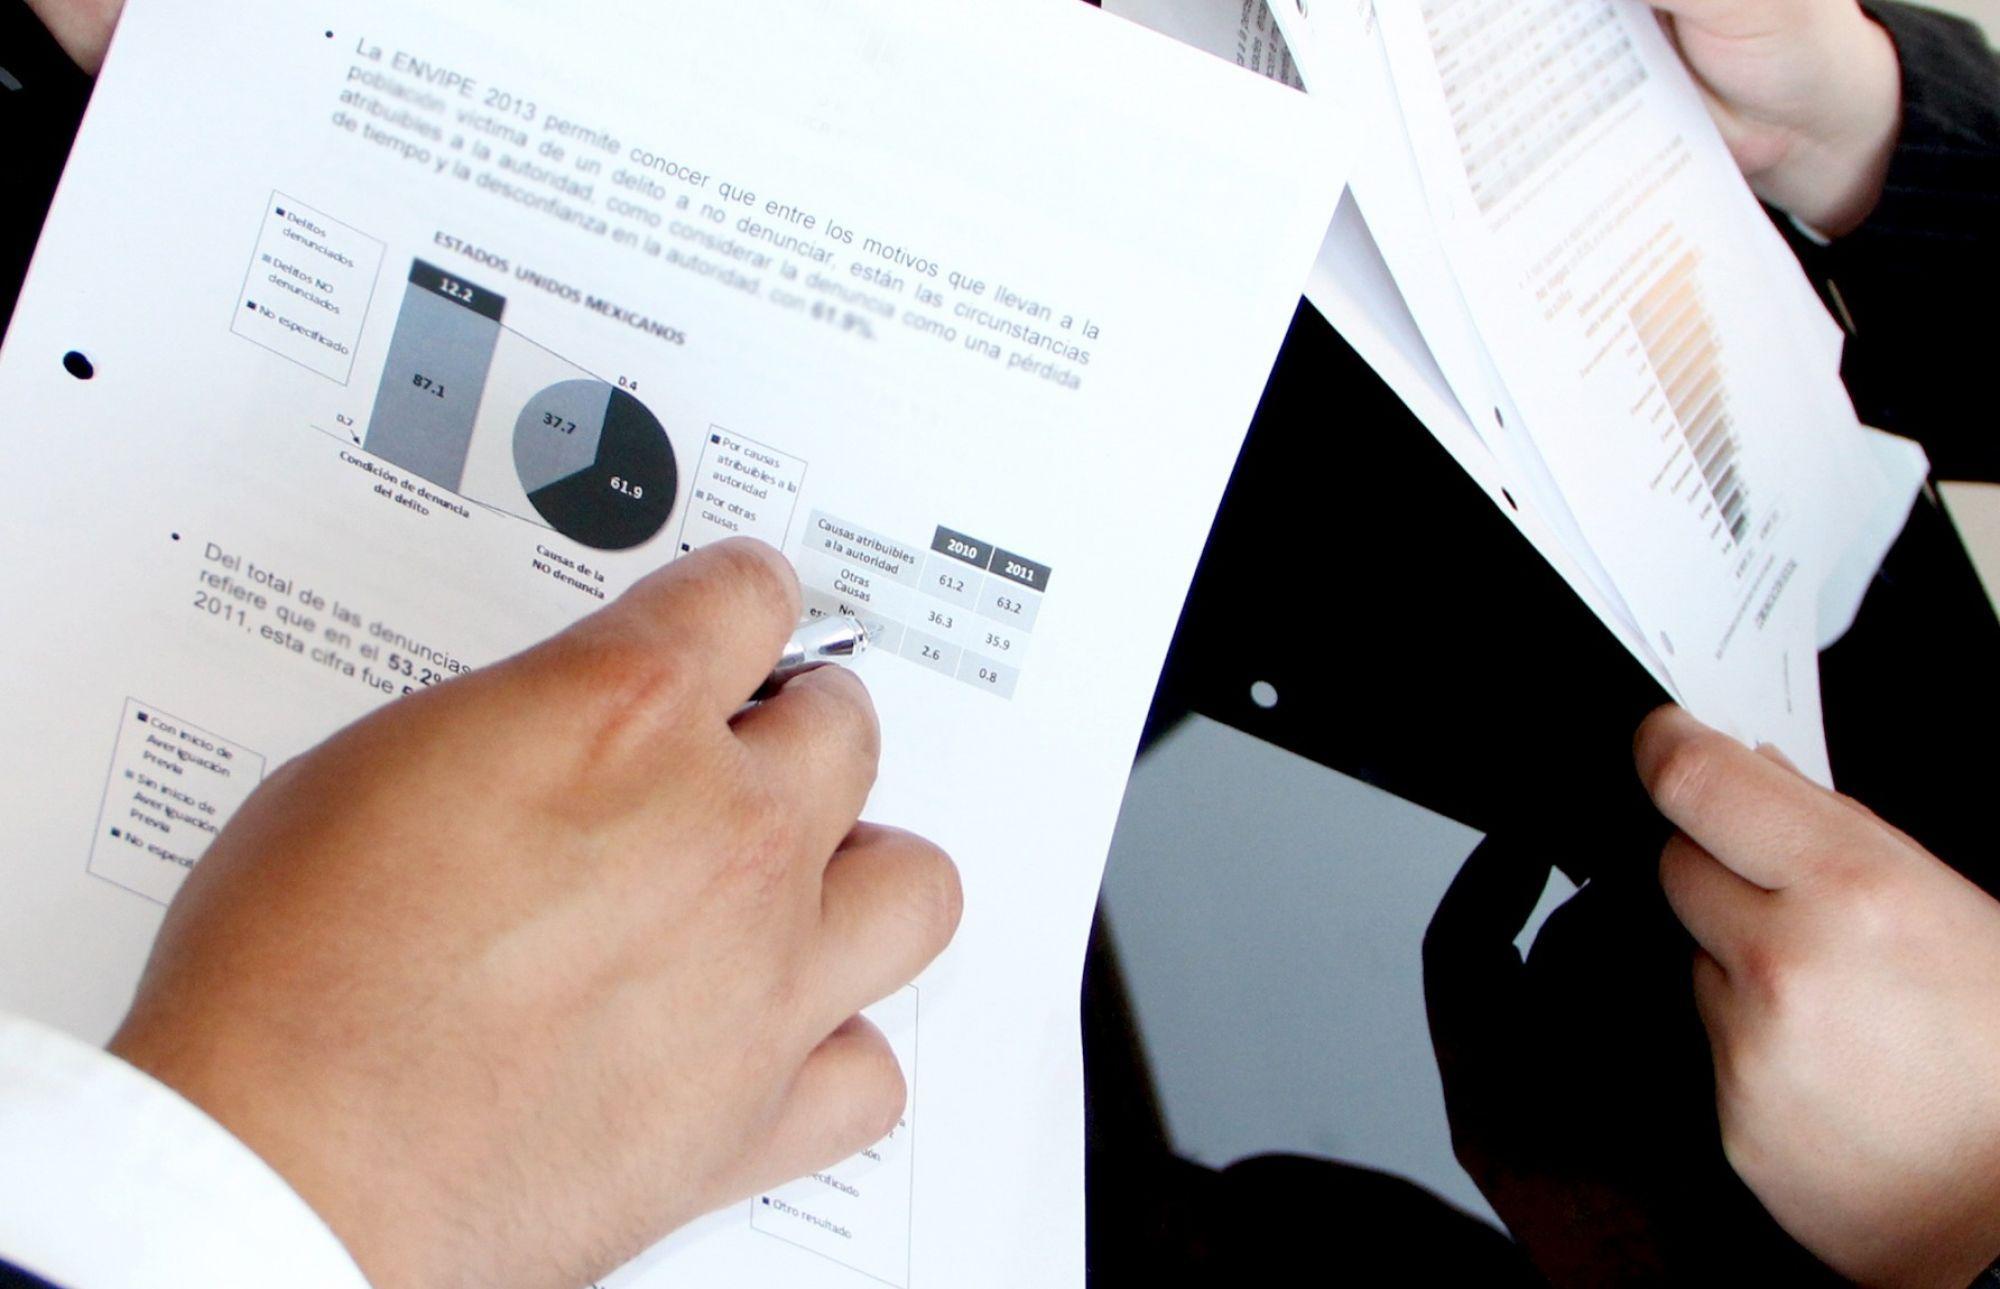 New public procurement thresholds announced